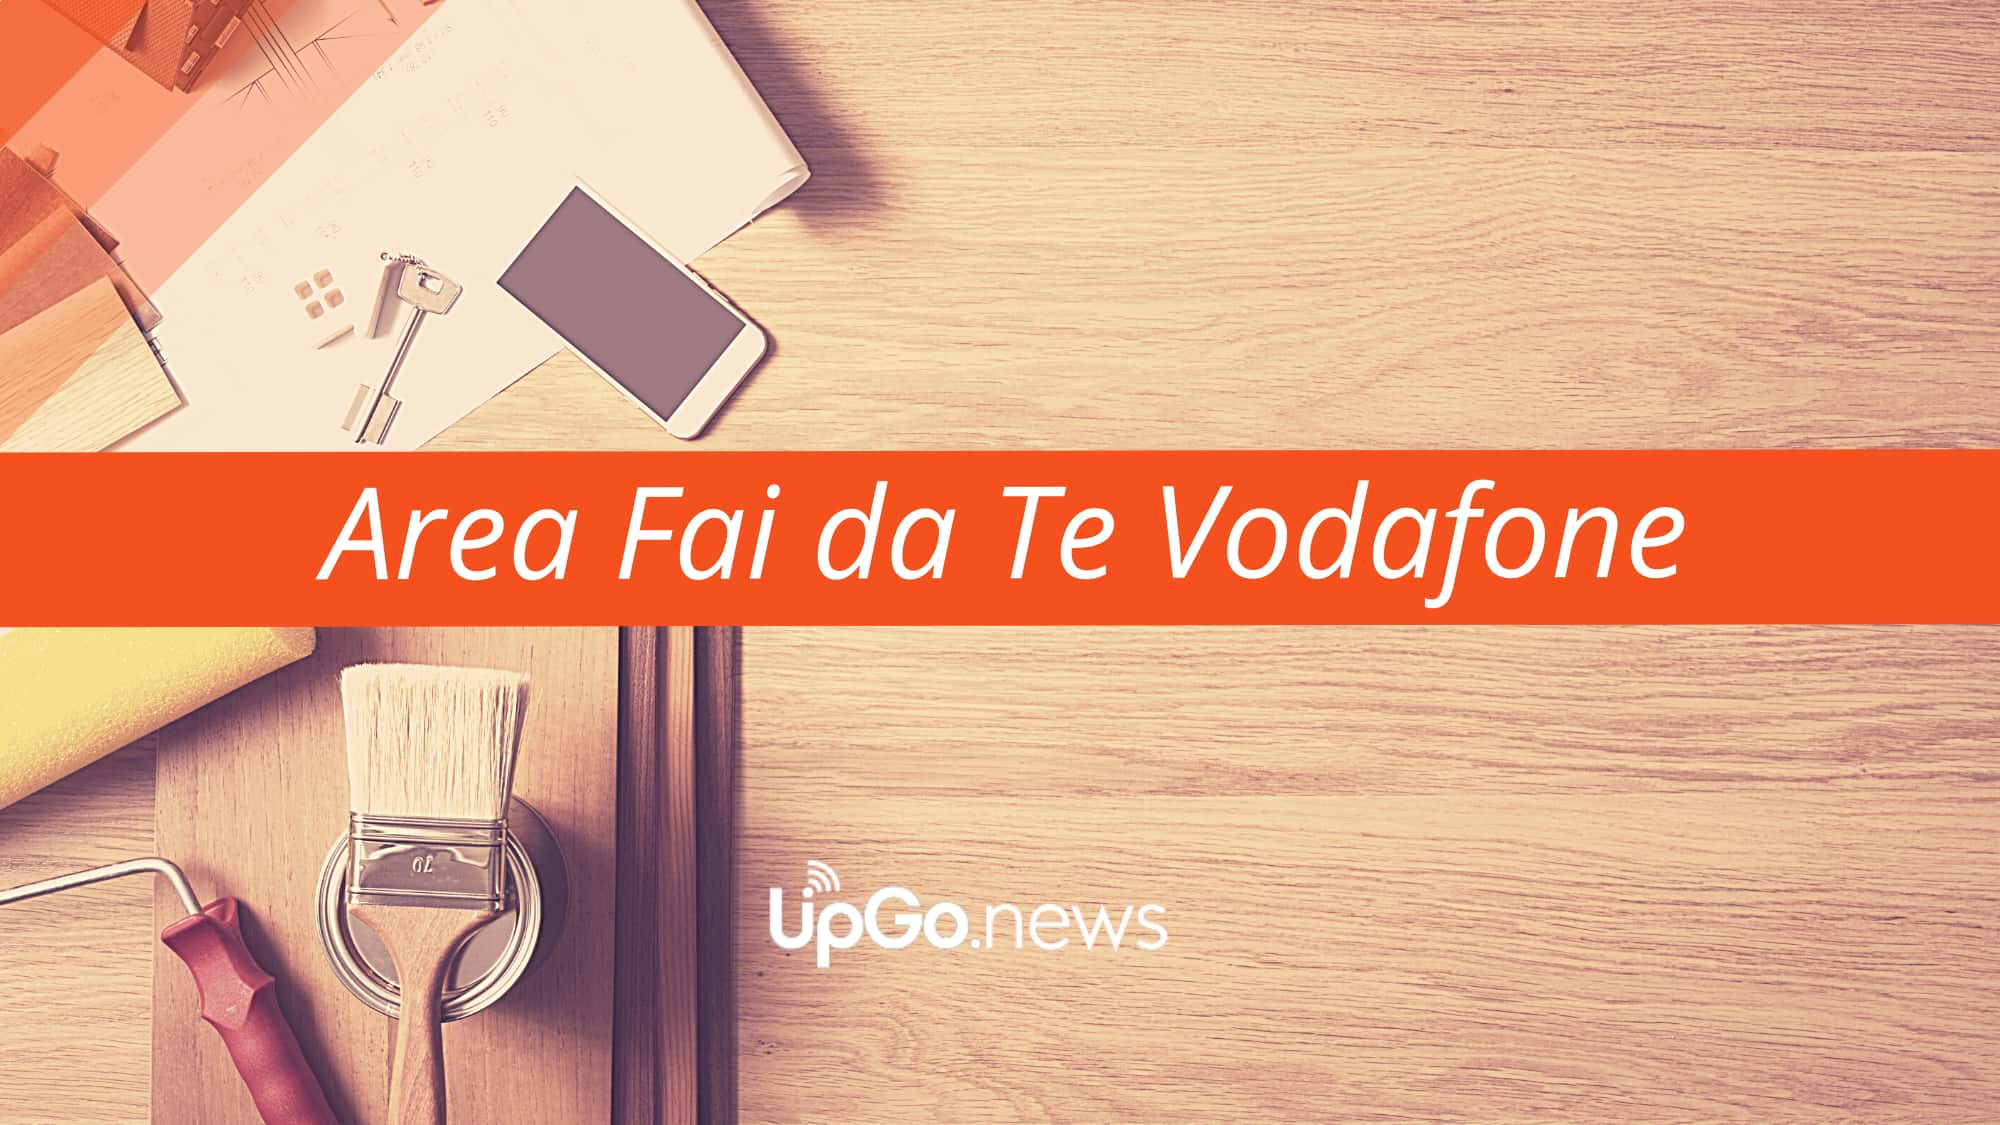 Area Fai da Te Vodafone